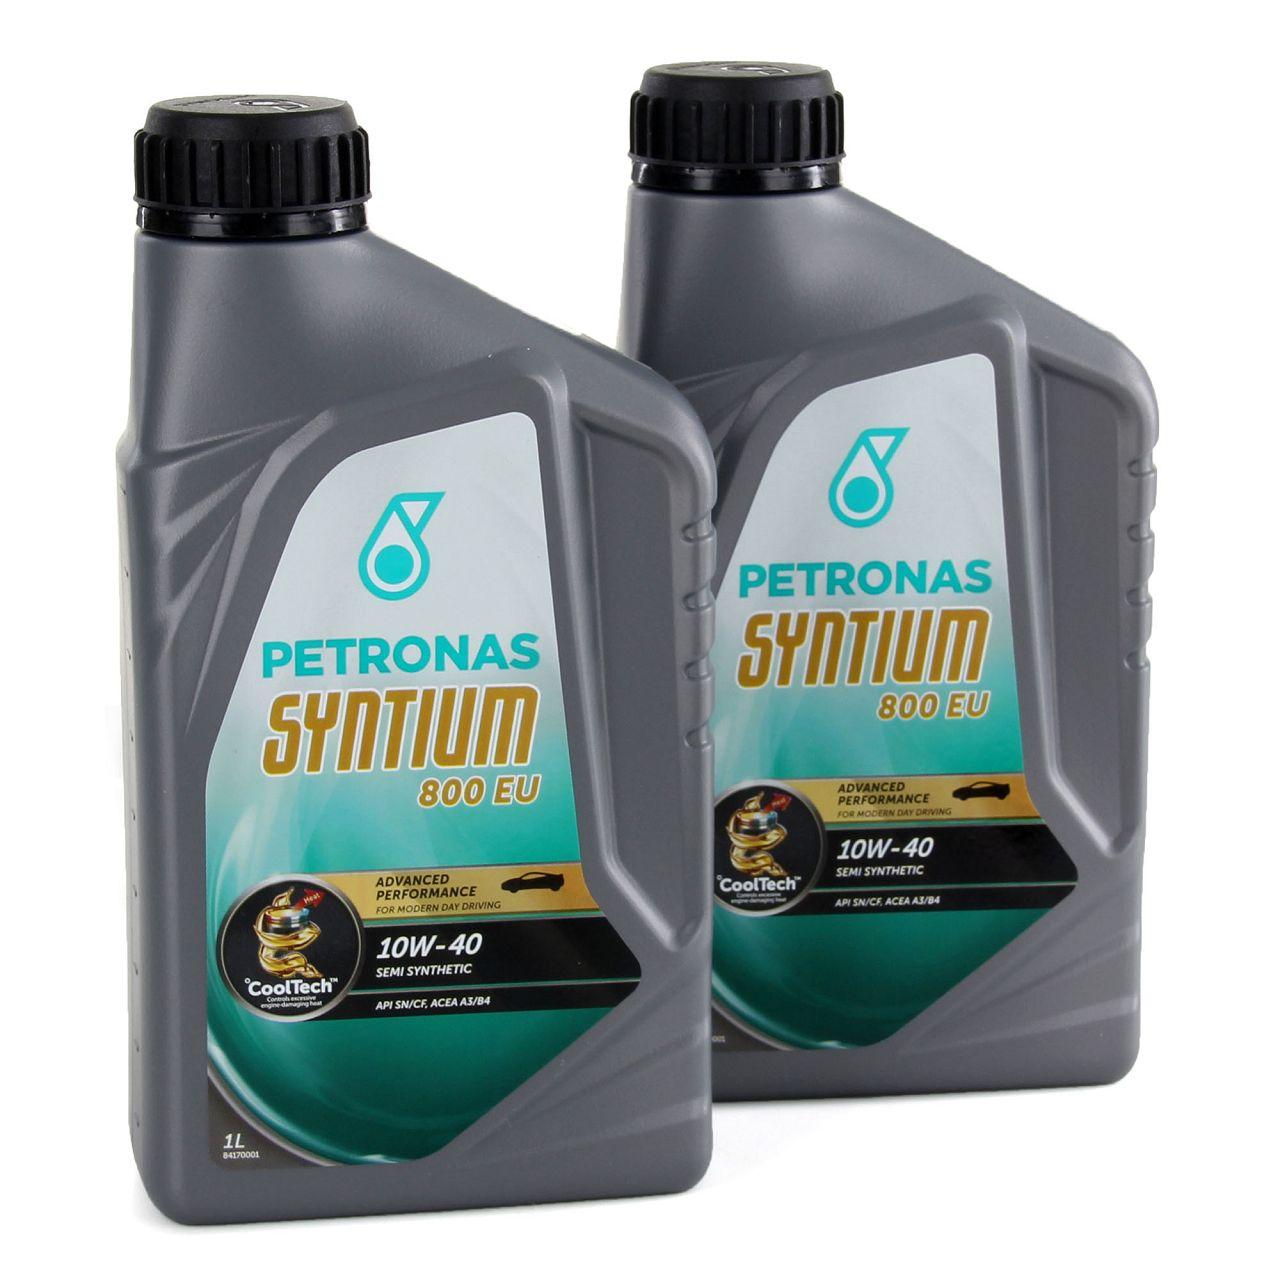 2L PETRONAS Syntium 800 EU Motoröl Öl 10W40 MB 229.1 ACEA A3/B4 API SN/CF